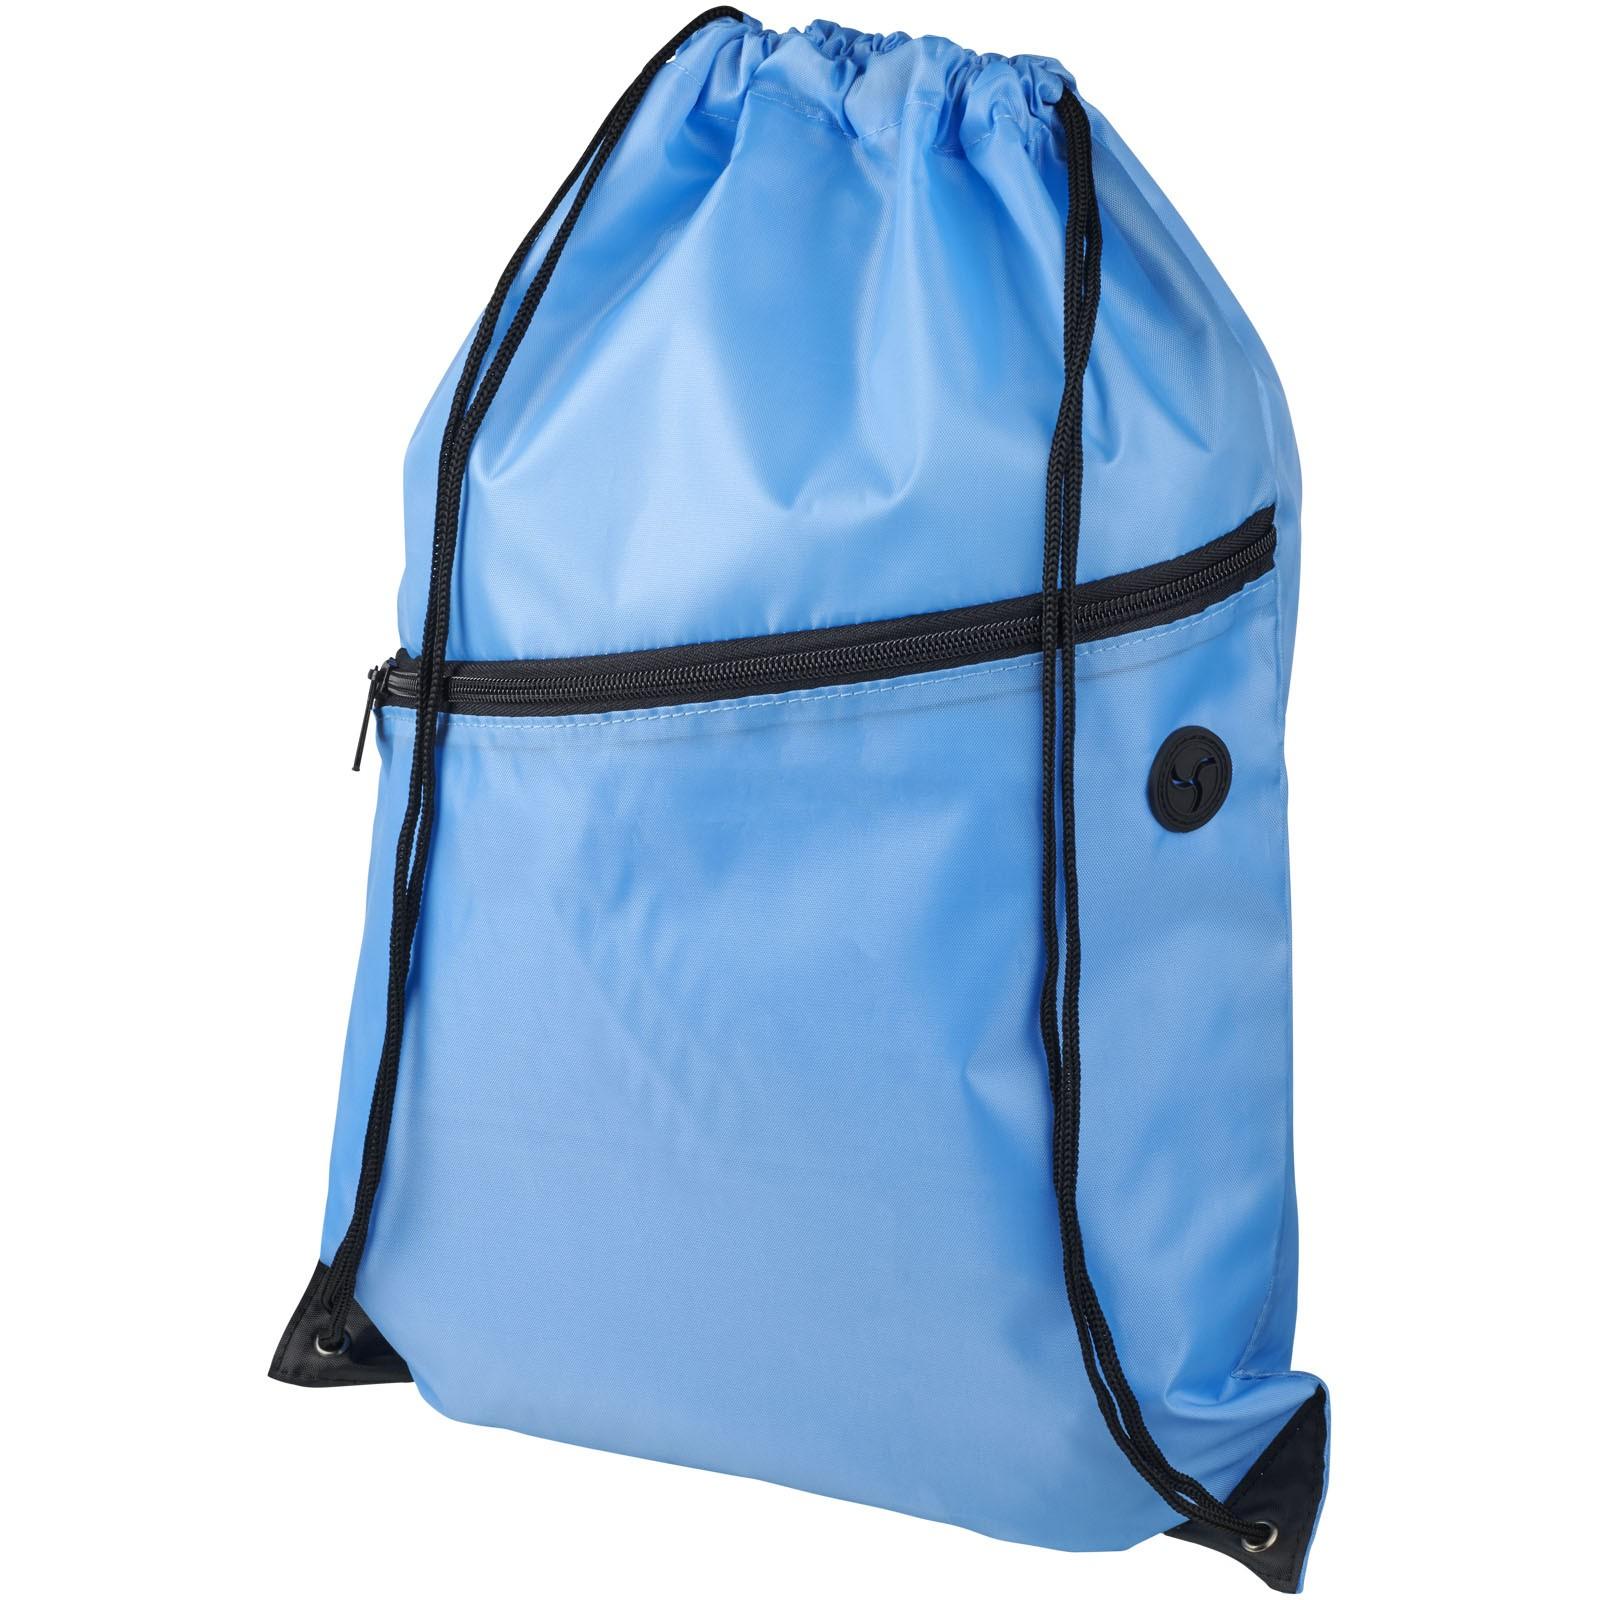 Oriole zippered drawstring backpack - Light blue